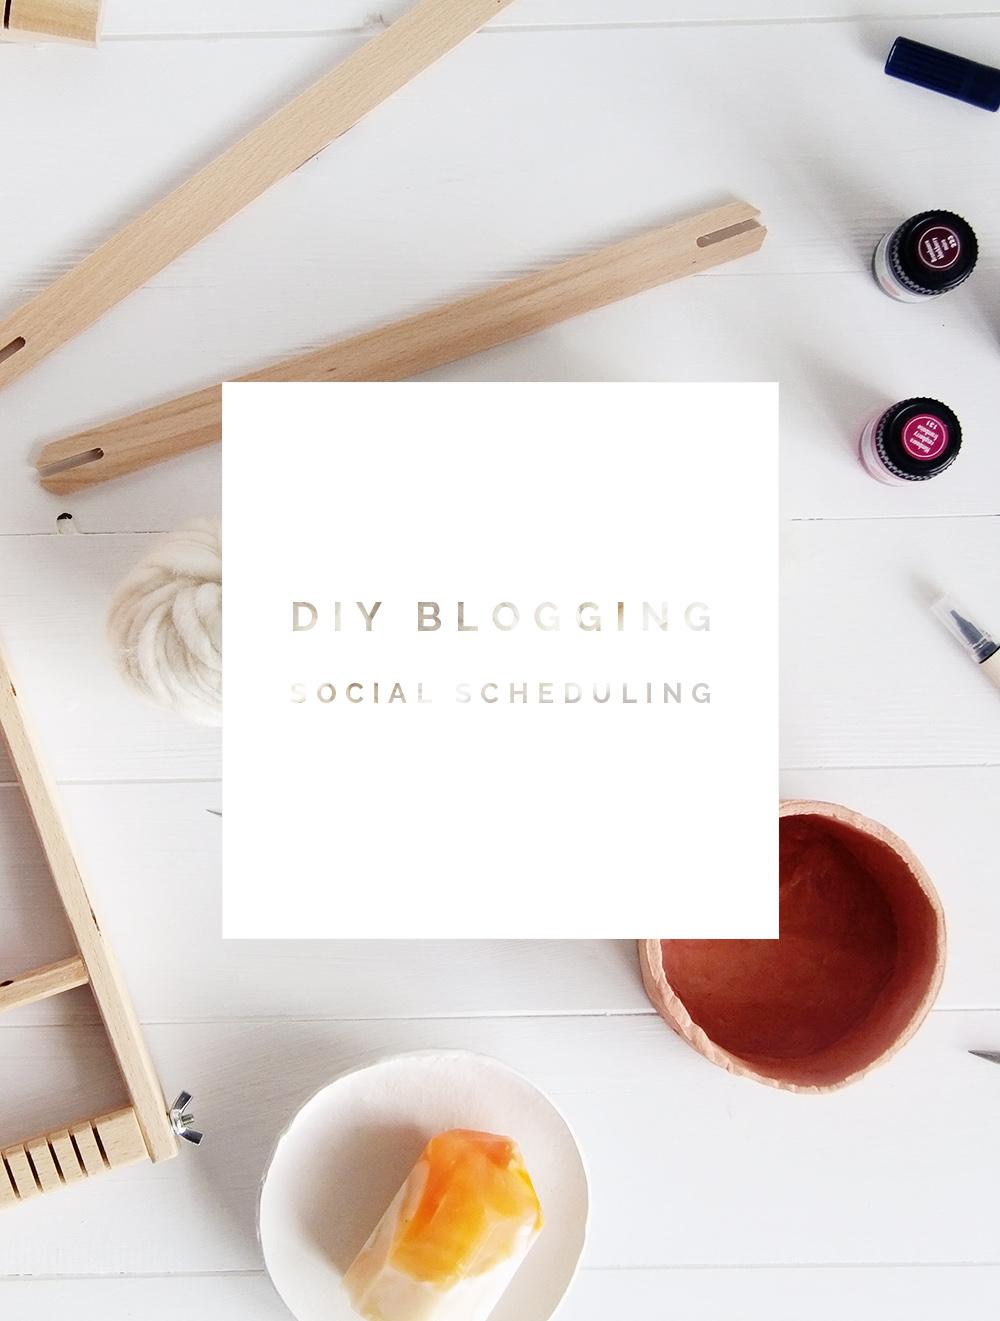 DIY-Blogging-Social-Scheduling-Fall-For-DIY